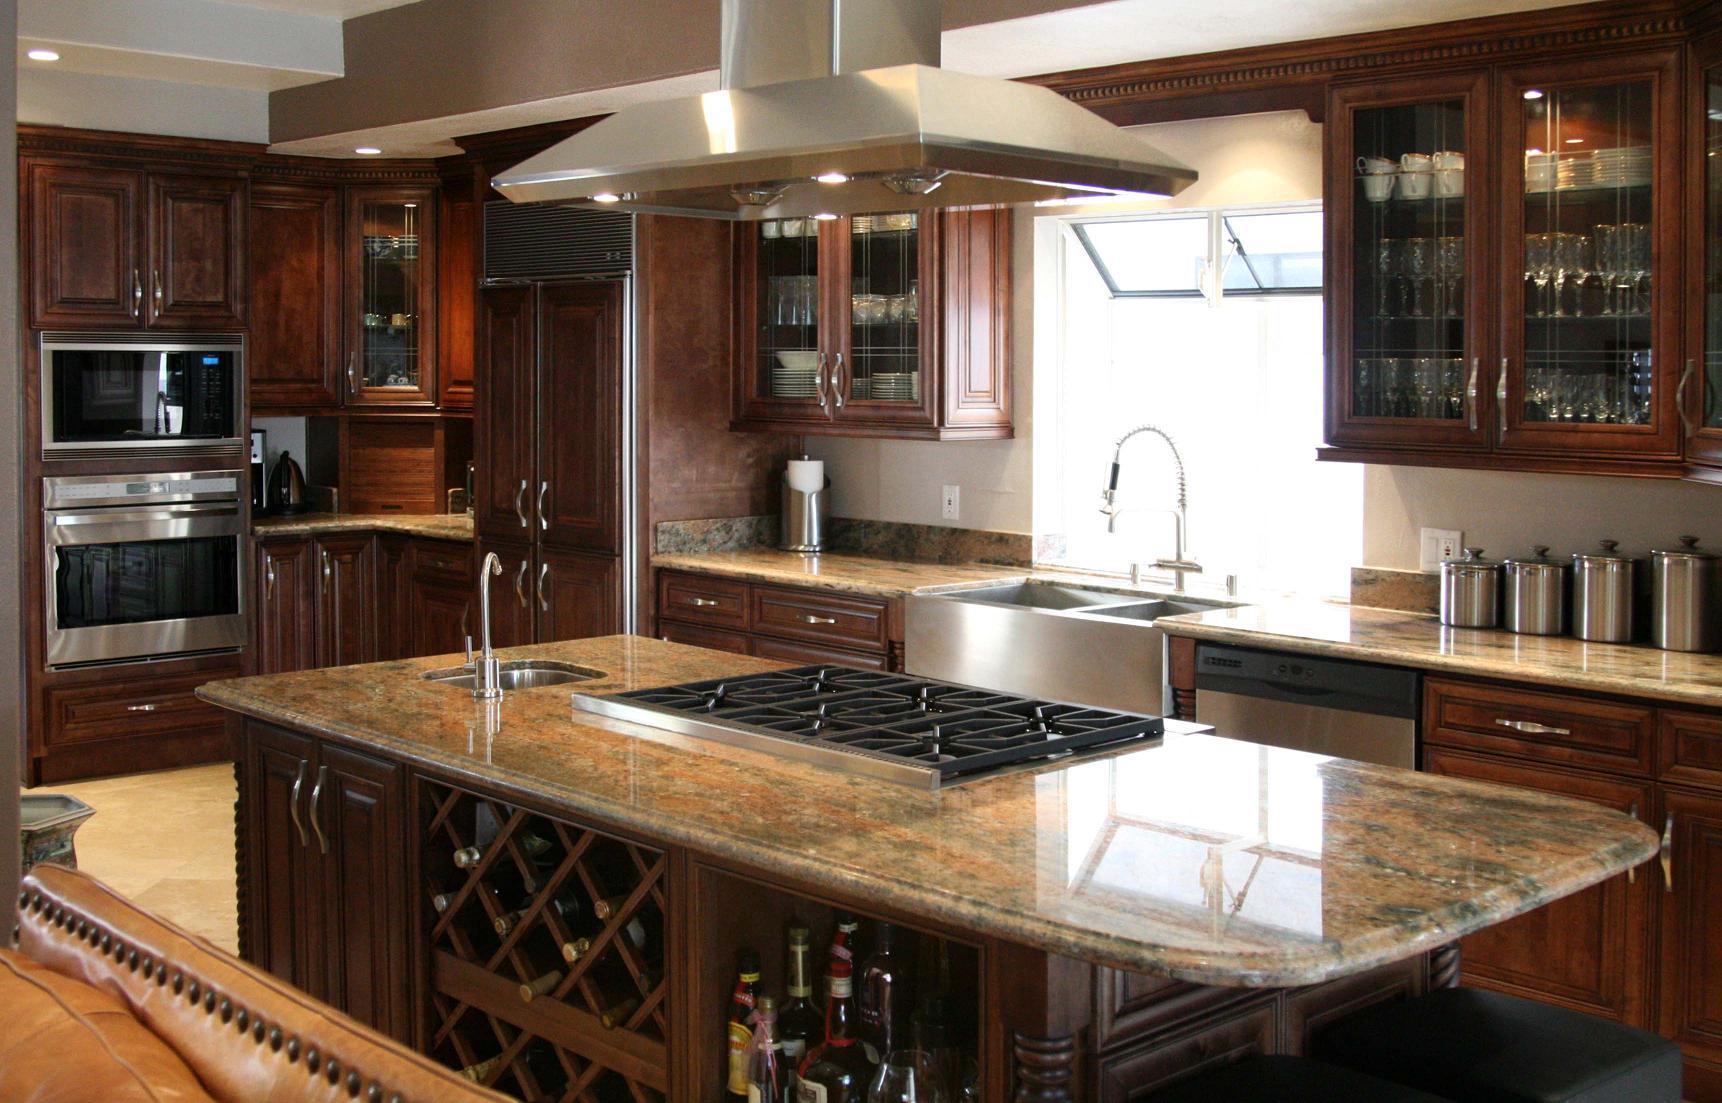 Green kitchen appliances Photo - 3